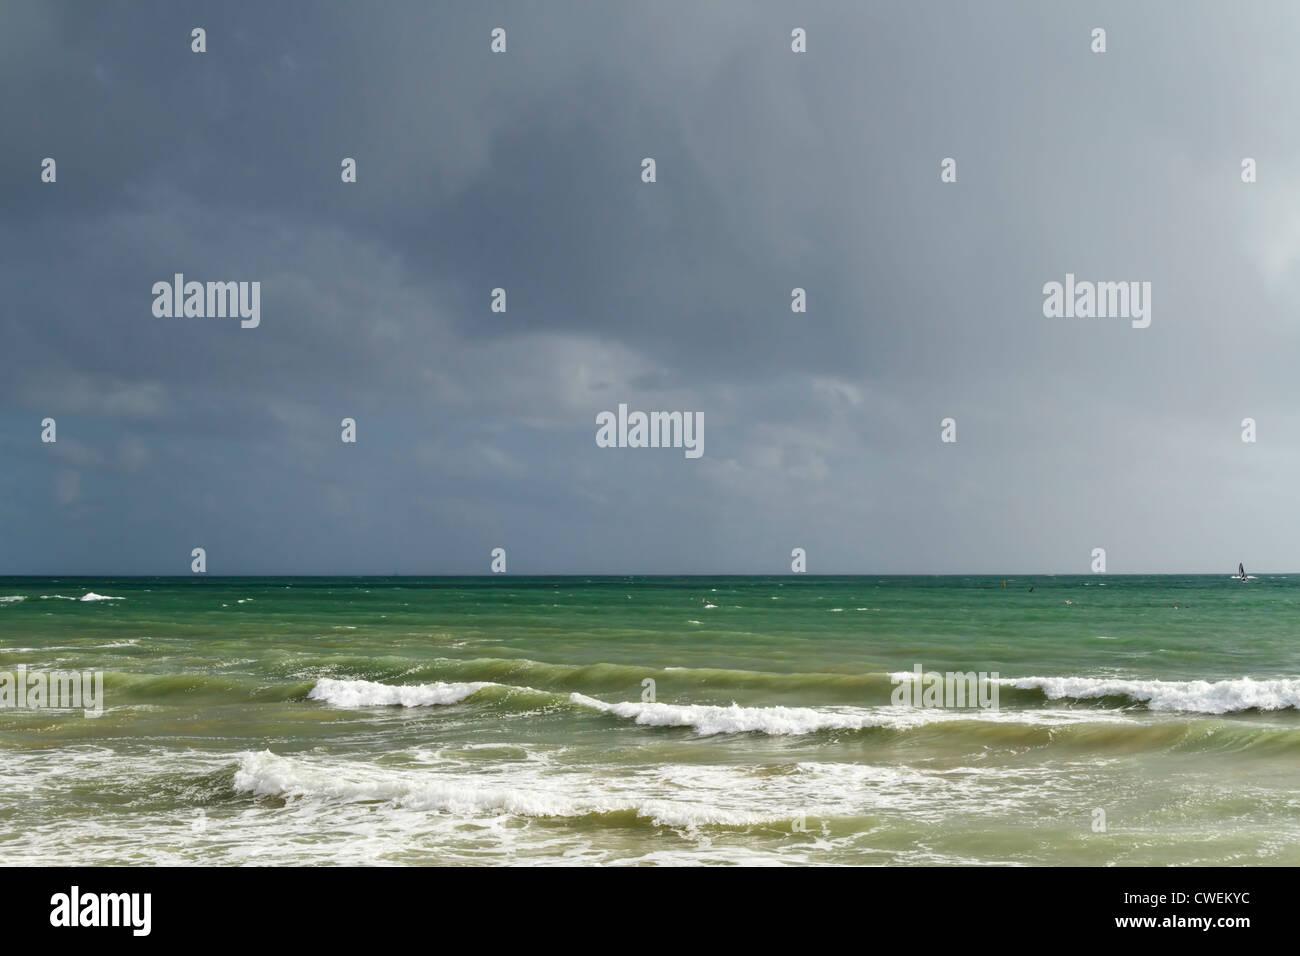 Atlantic ocean on west coast of France, Europe. - Stock Image